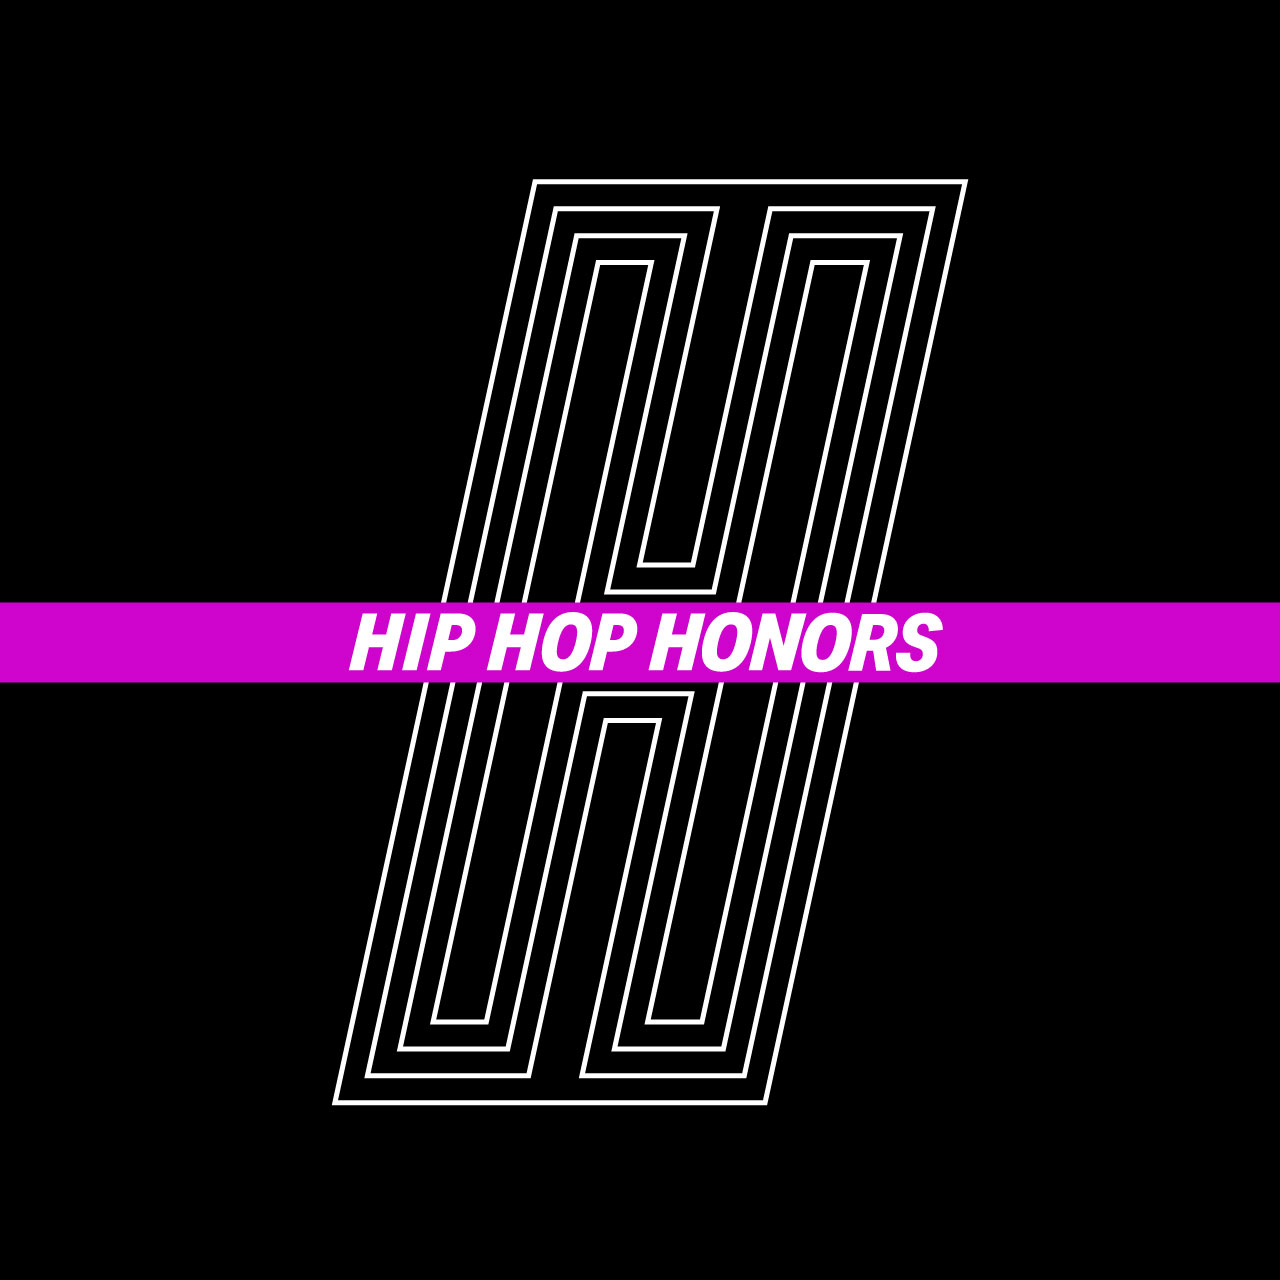 Hip Hop Honors - Wikipedia